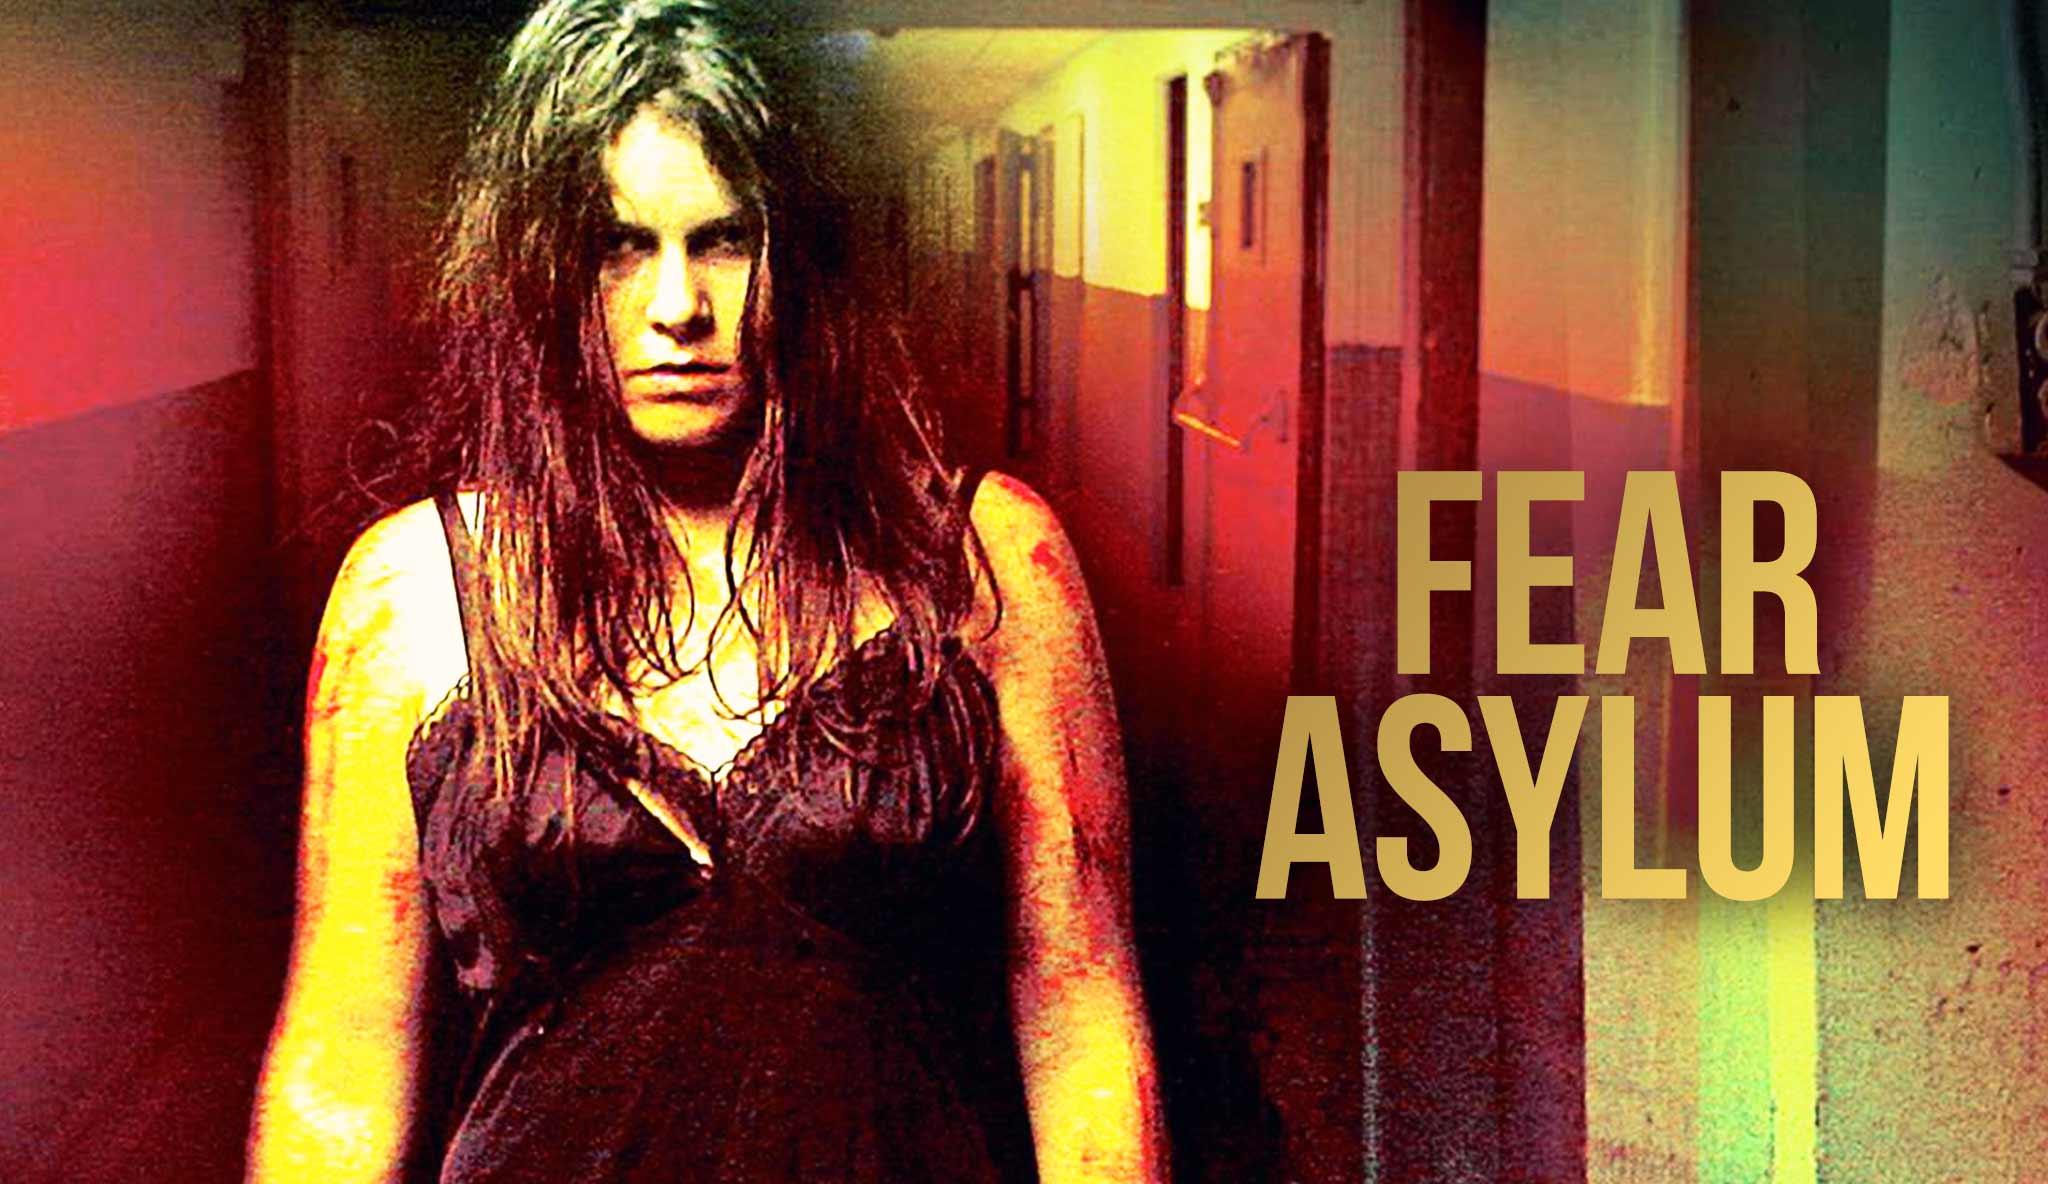 fear-asylum-room-33\header.jpg